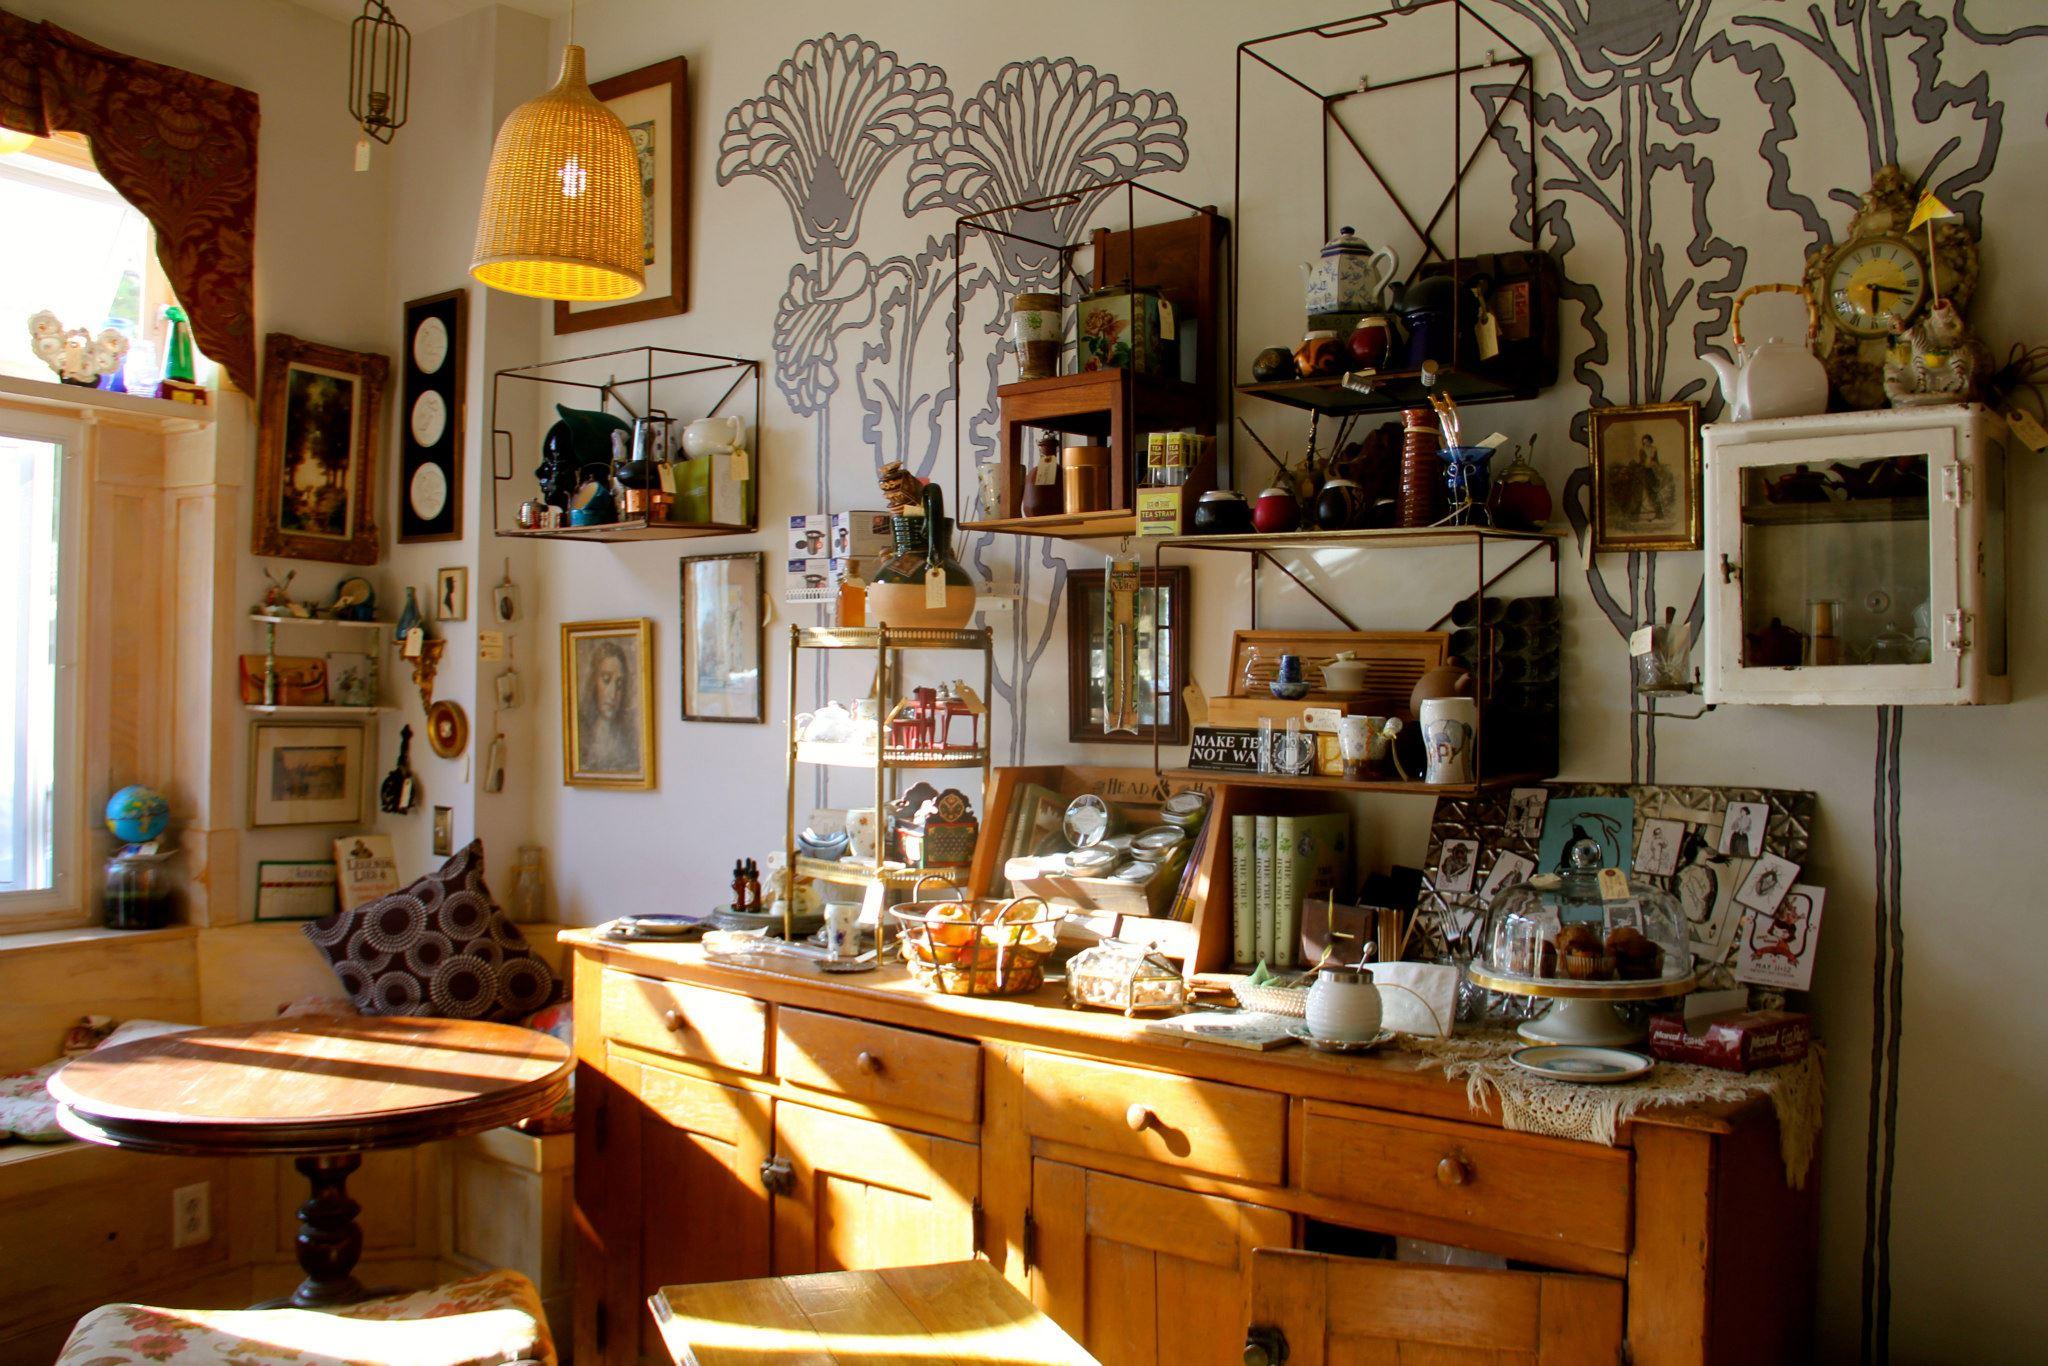 Random Tea Room & Curiosity Shop, Philadelphia, PA, USA